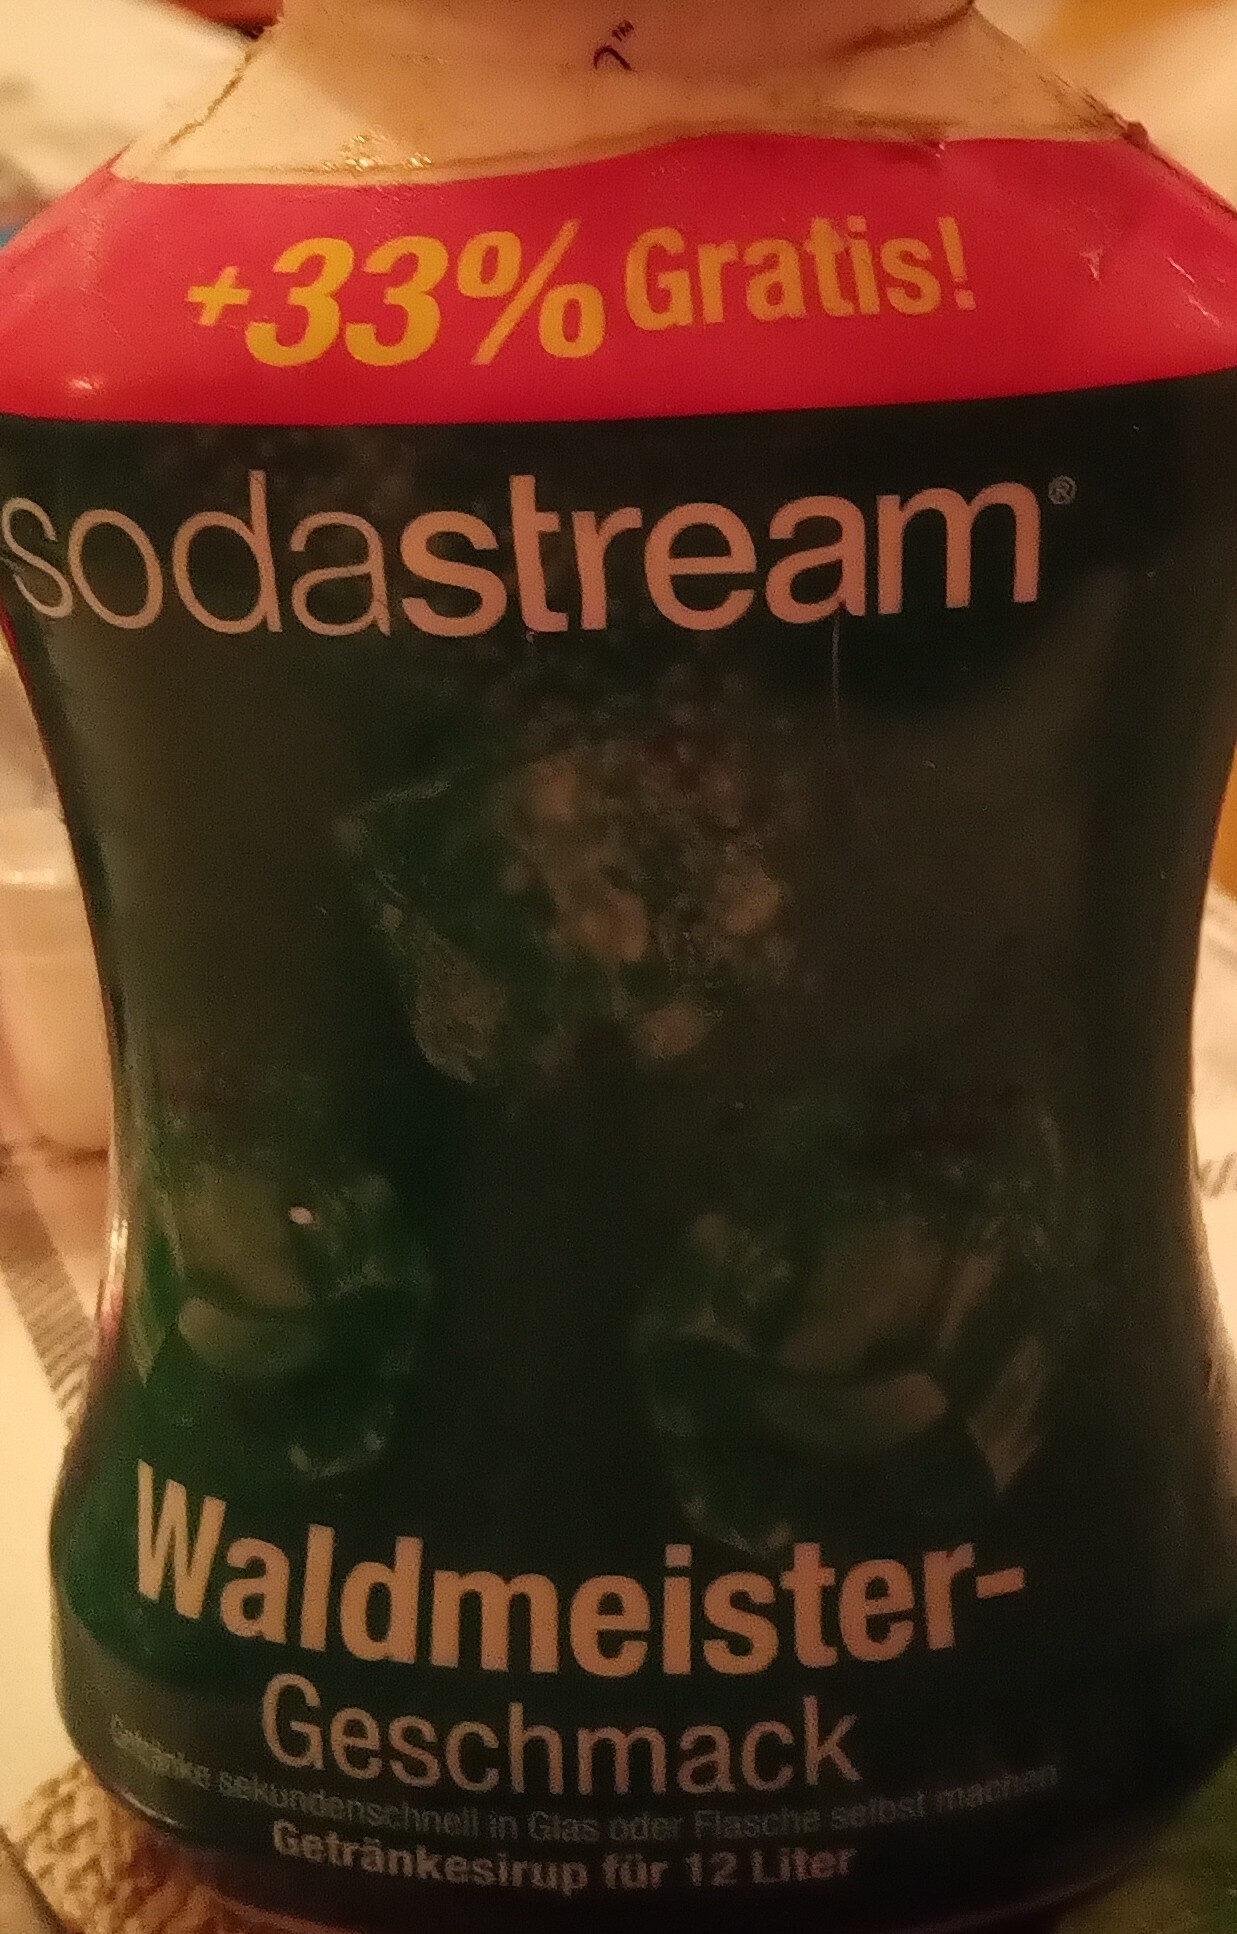 SodaStream Waldmeister-Geschmack - Product - de